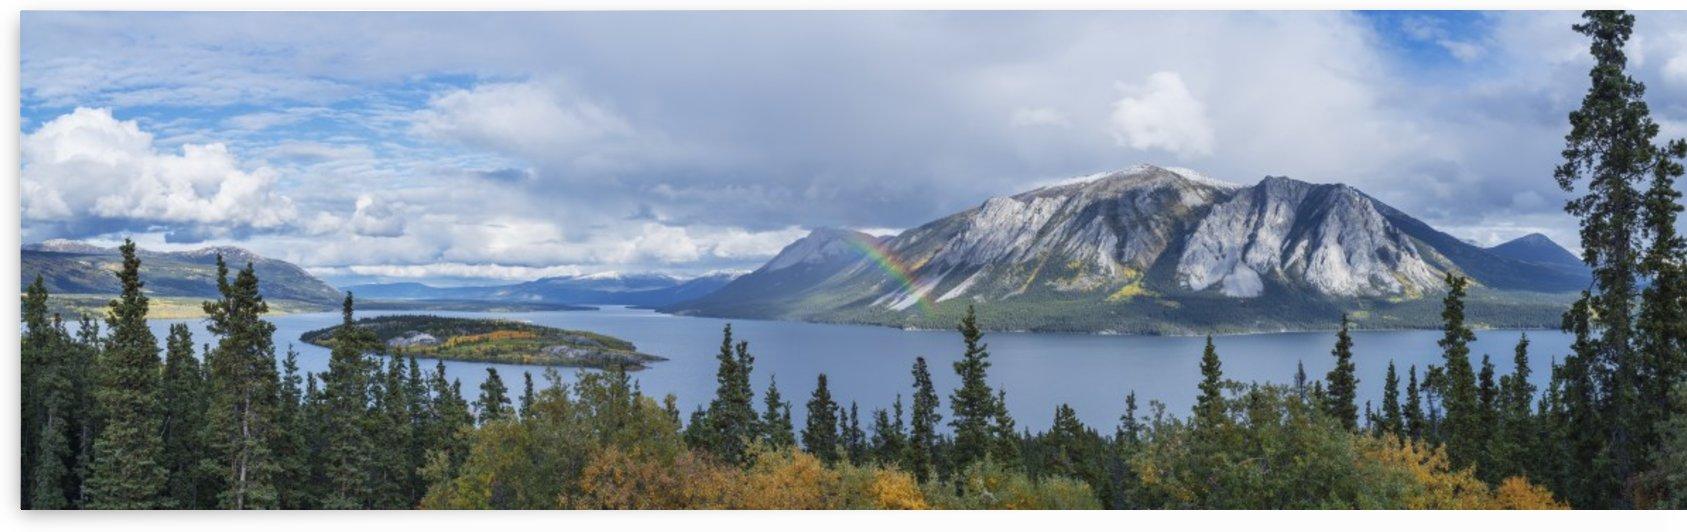 Fall showers create a rainbow over Tagish Lake, Bove Island, along the Klondike Highway, Yukon Territory, Canada by PacificStock